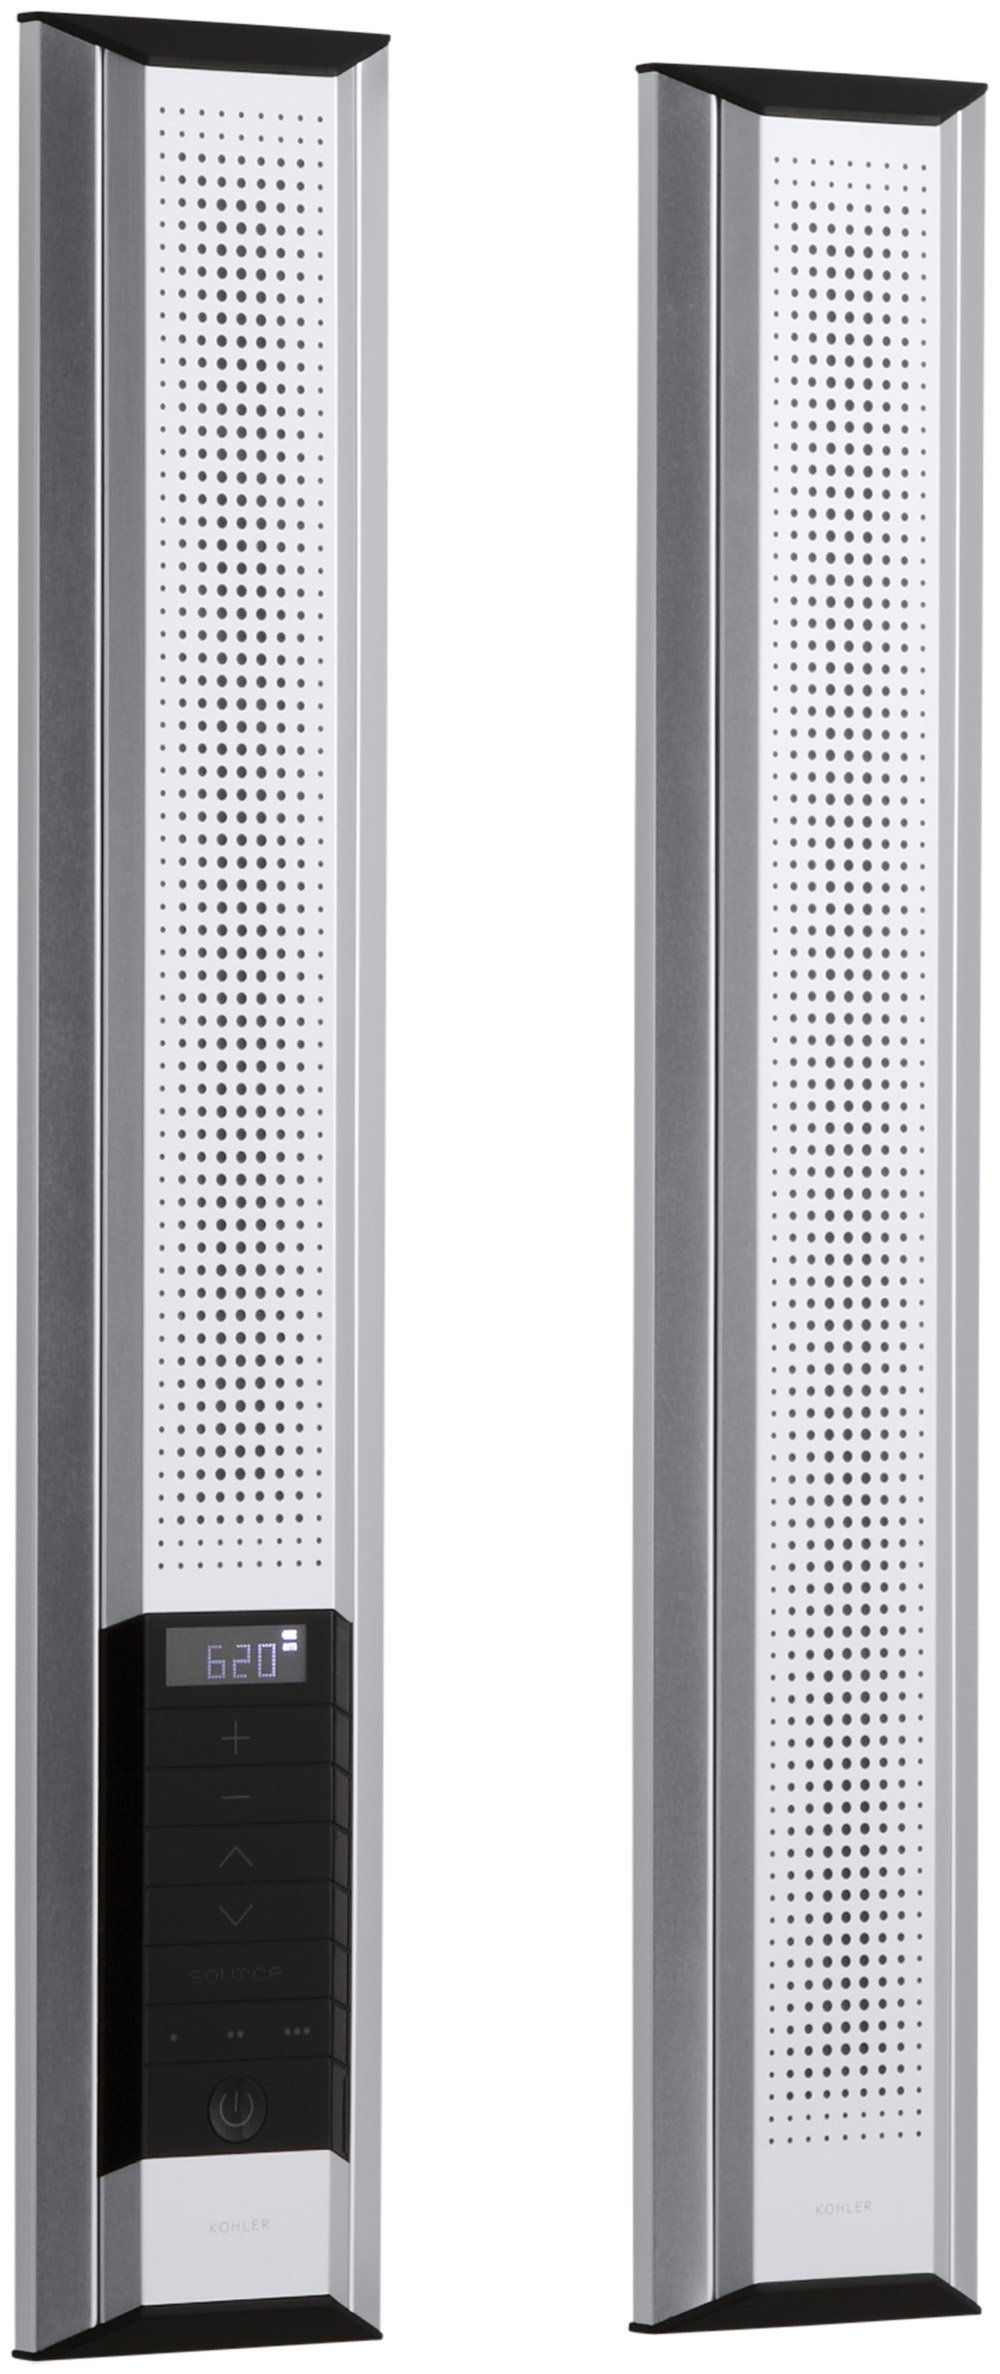 KOHLER K-2958-NA Stereostik Mirrored Cabinet Audio Add-on